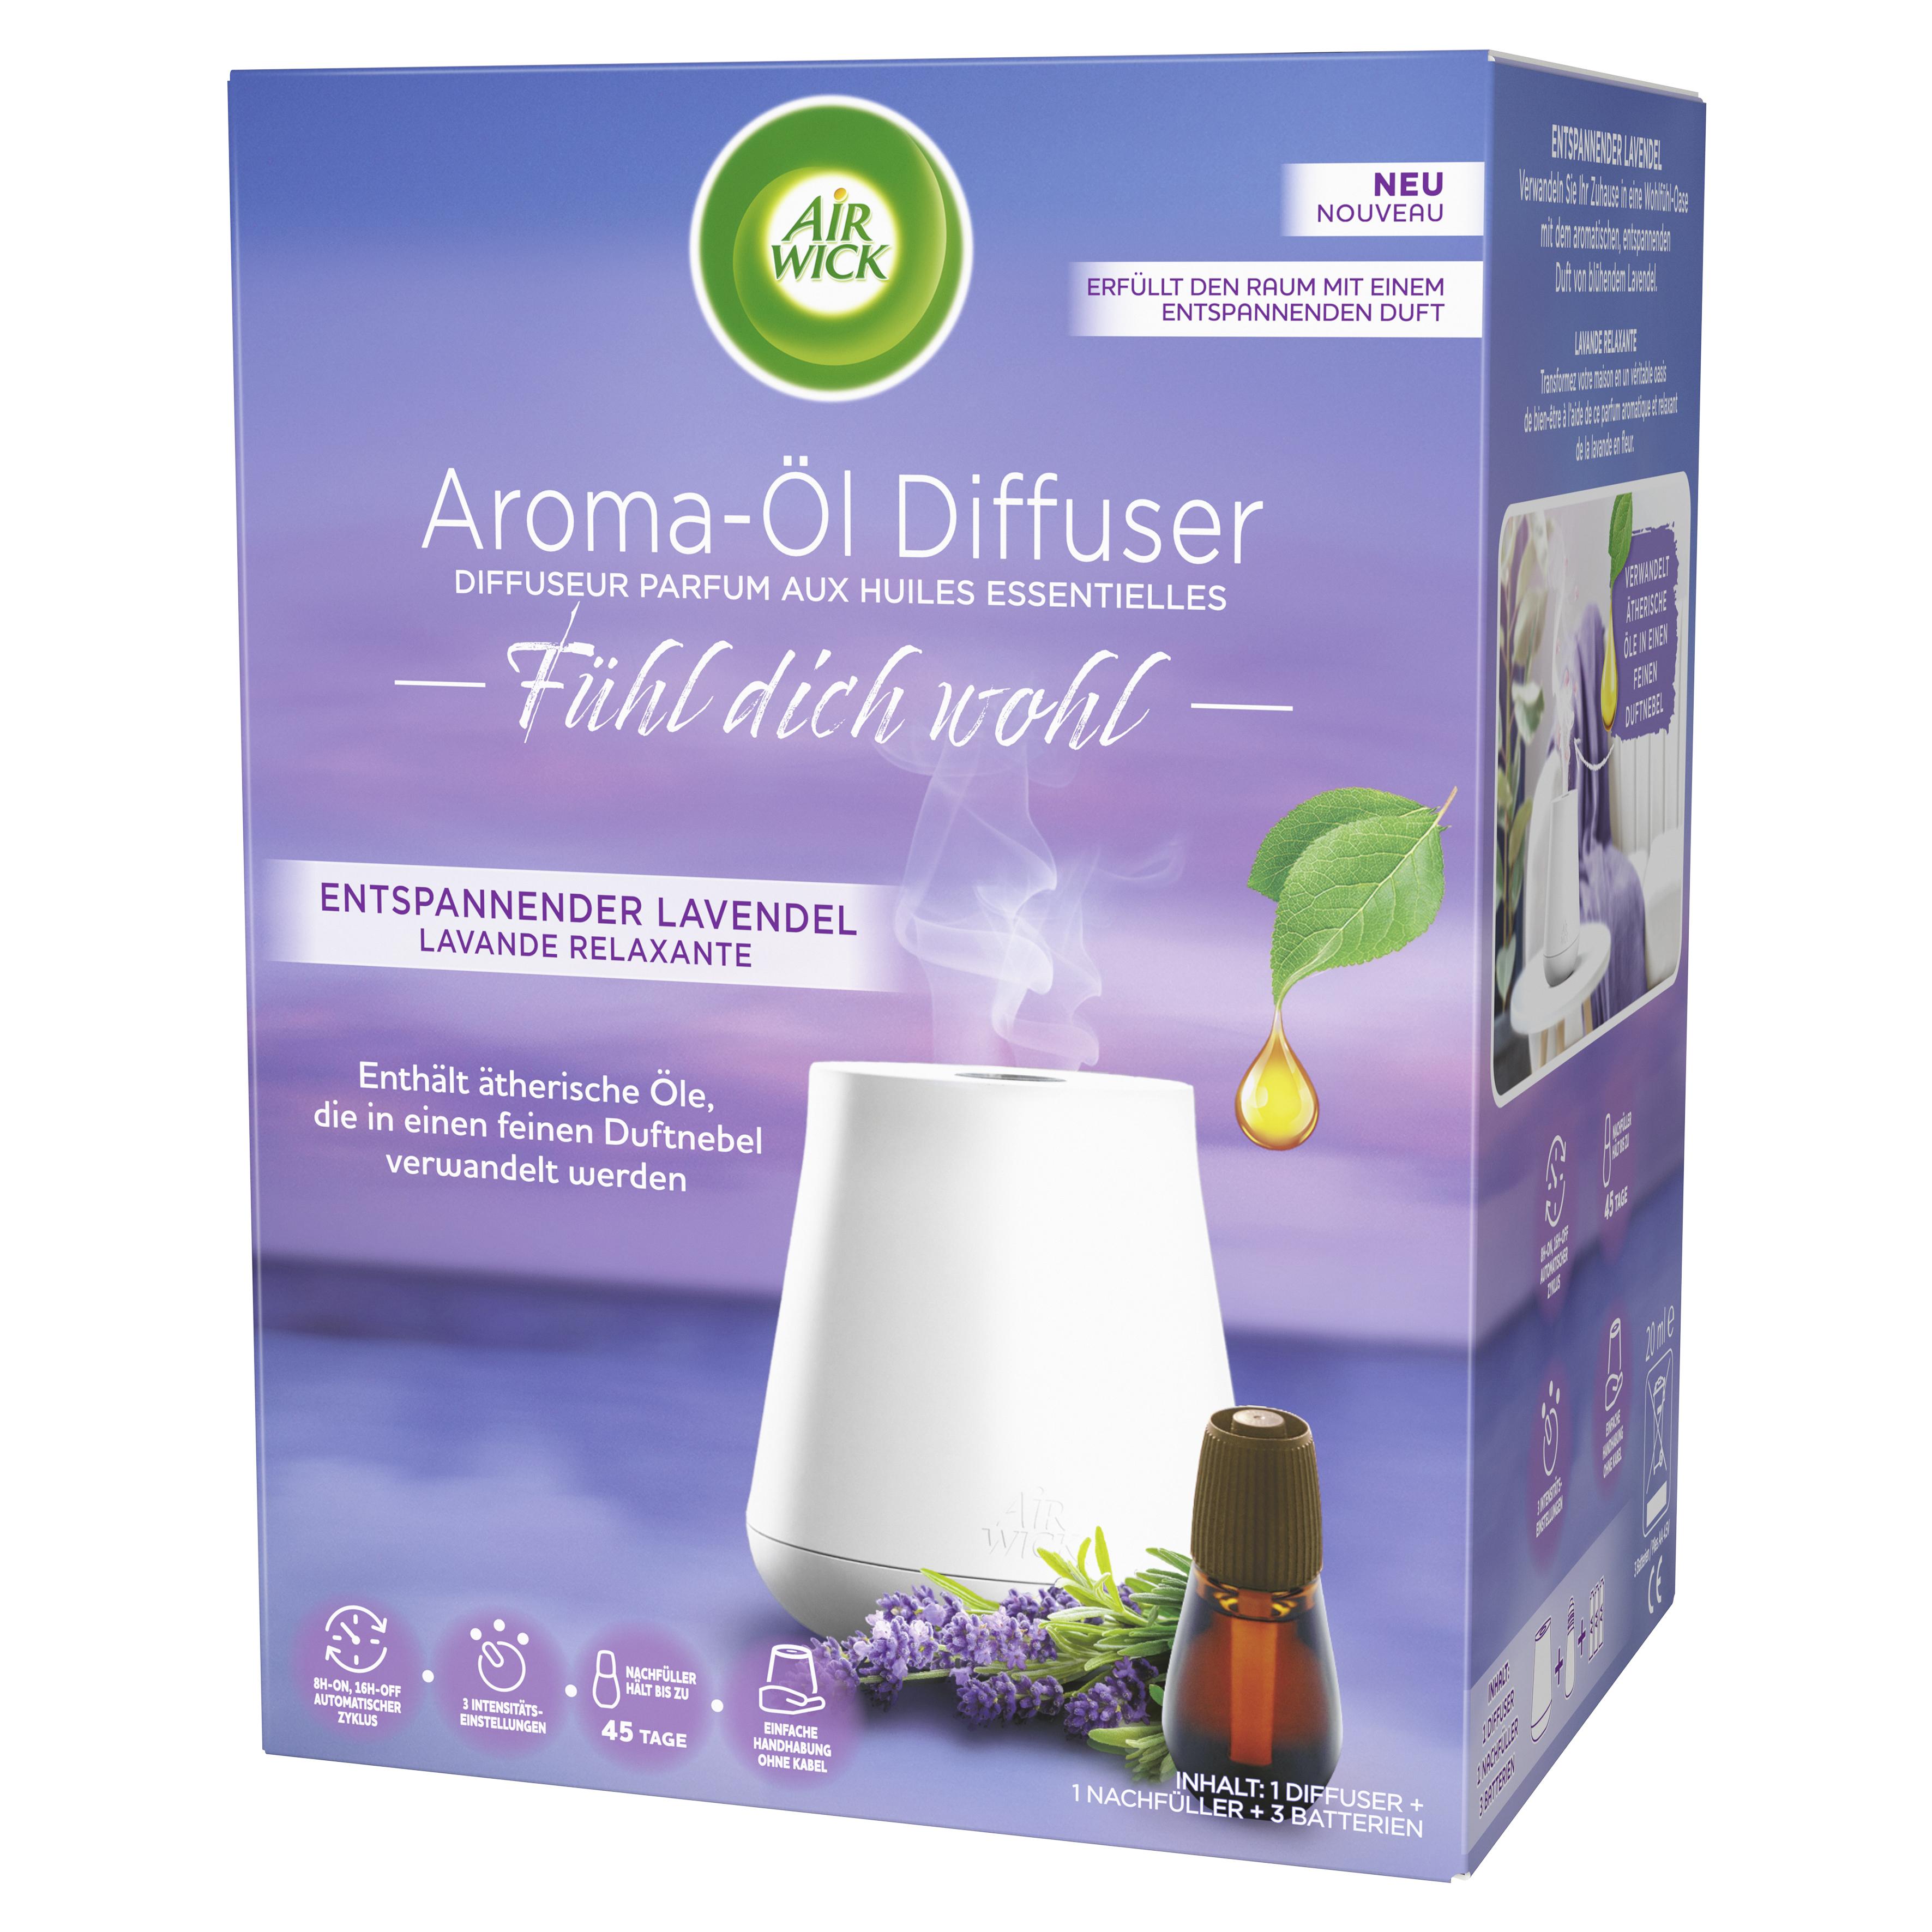 Air Wick Aroma-Öl Diffuser Starter-Set Entspannender Lavendel